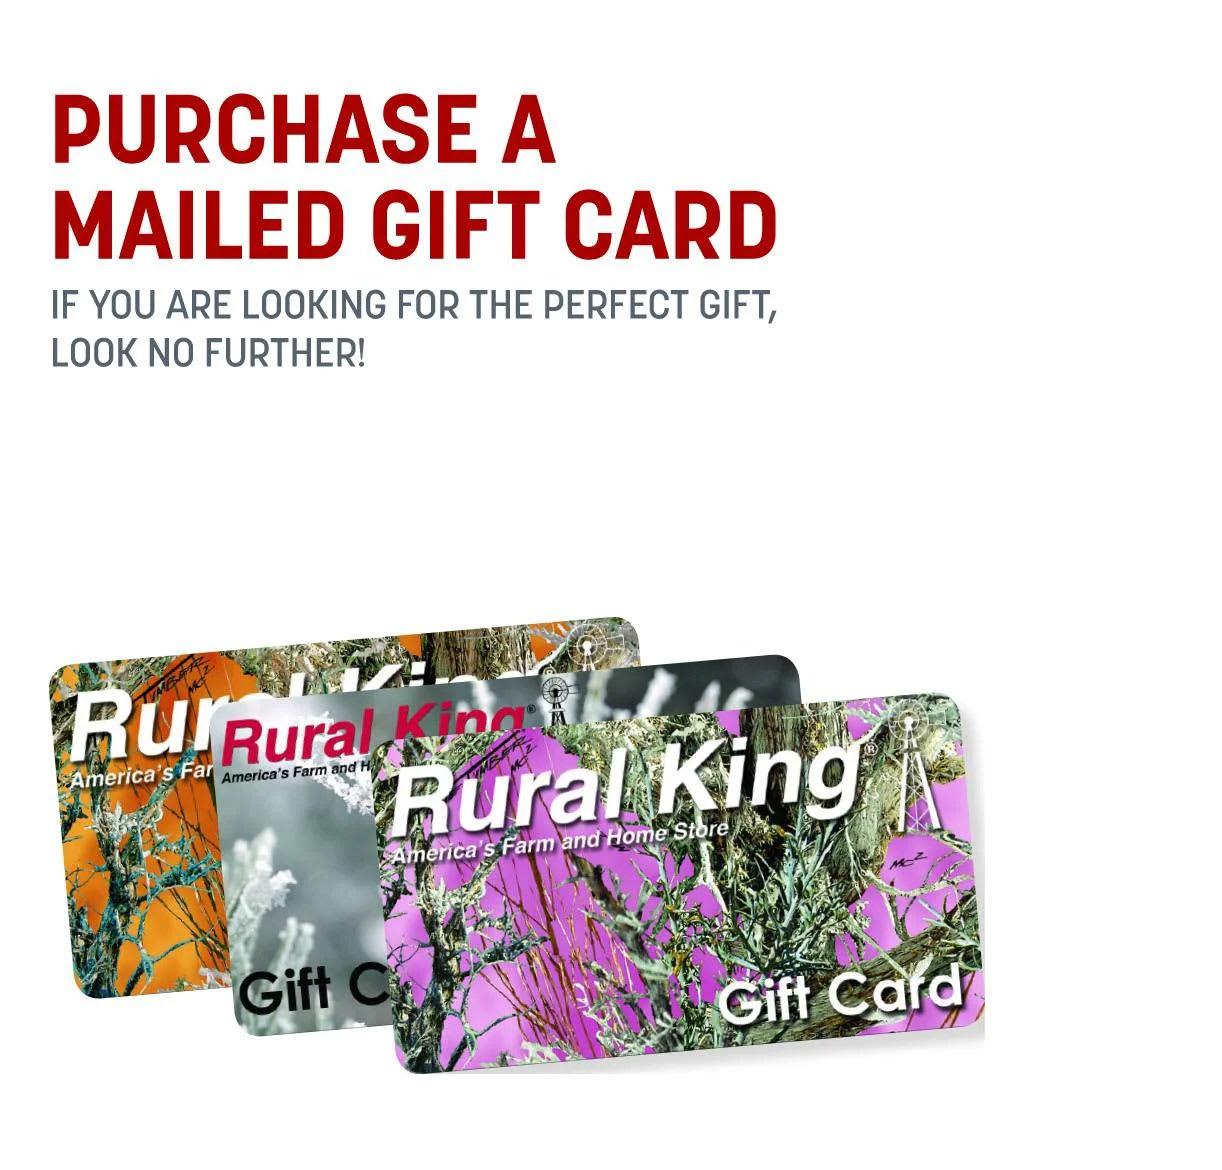 Rural King Gift Cards